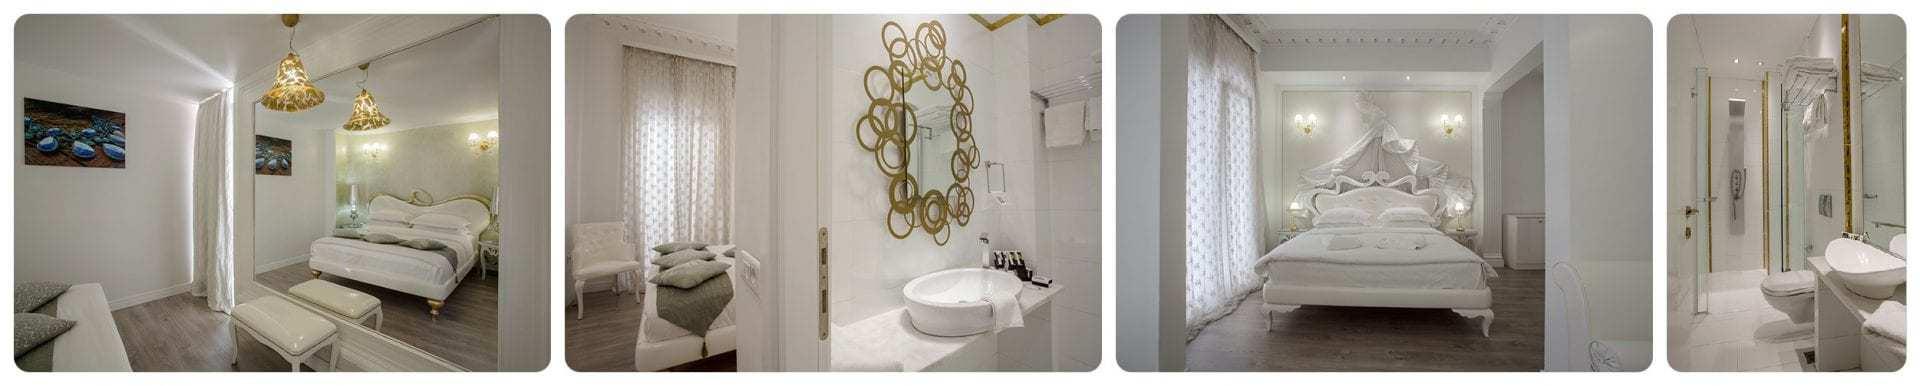 Athens Diamond hoΜtel - תמונות החדרים מתוך האתר הרשמי